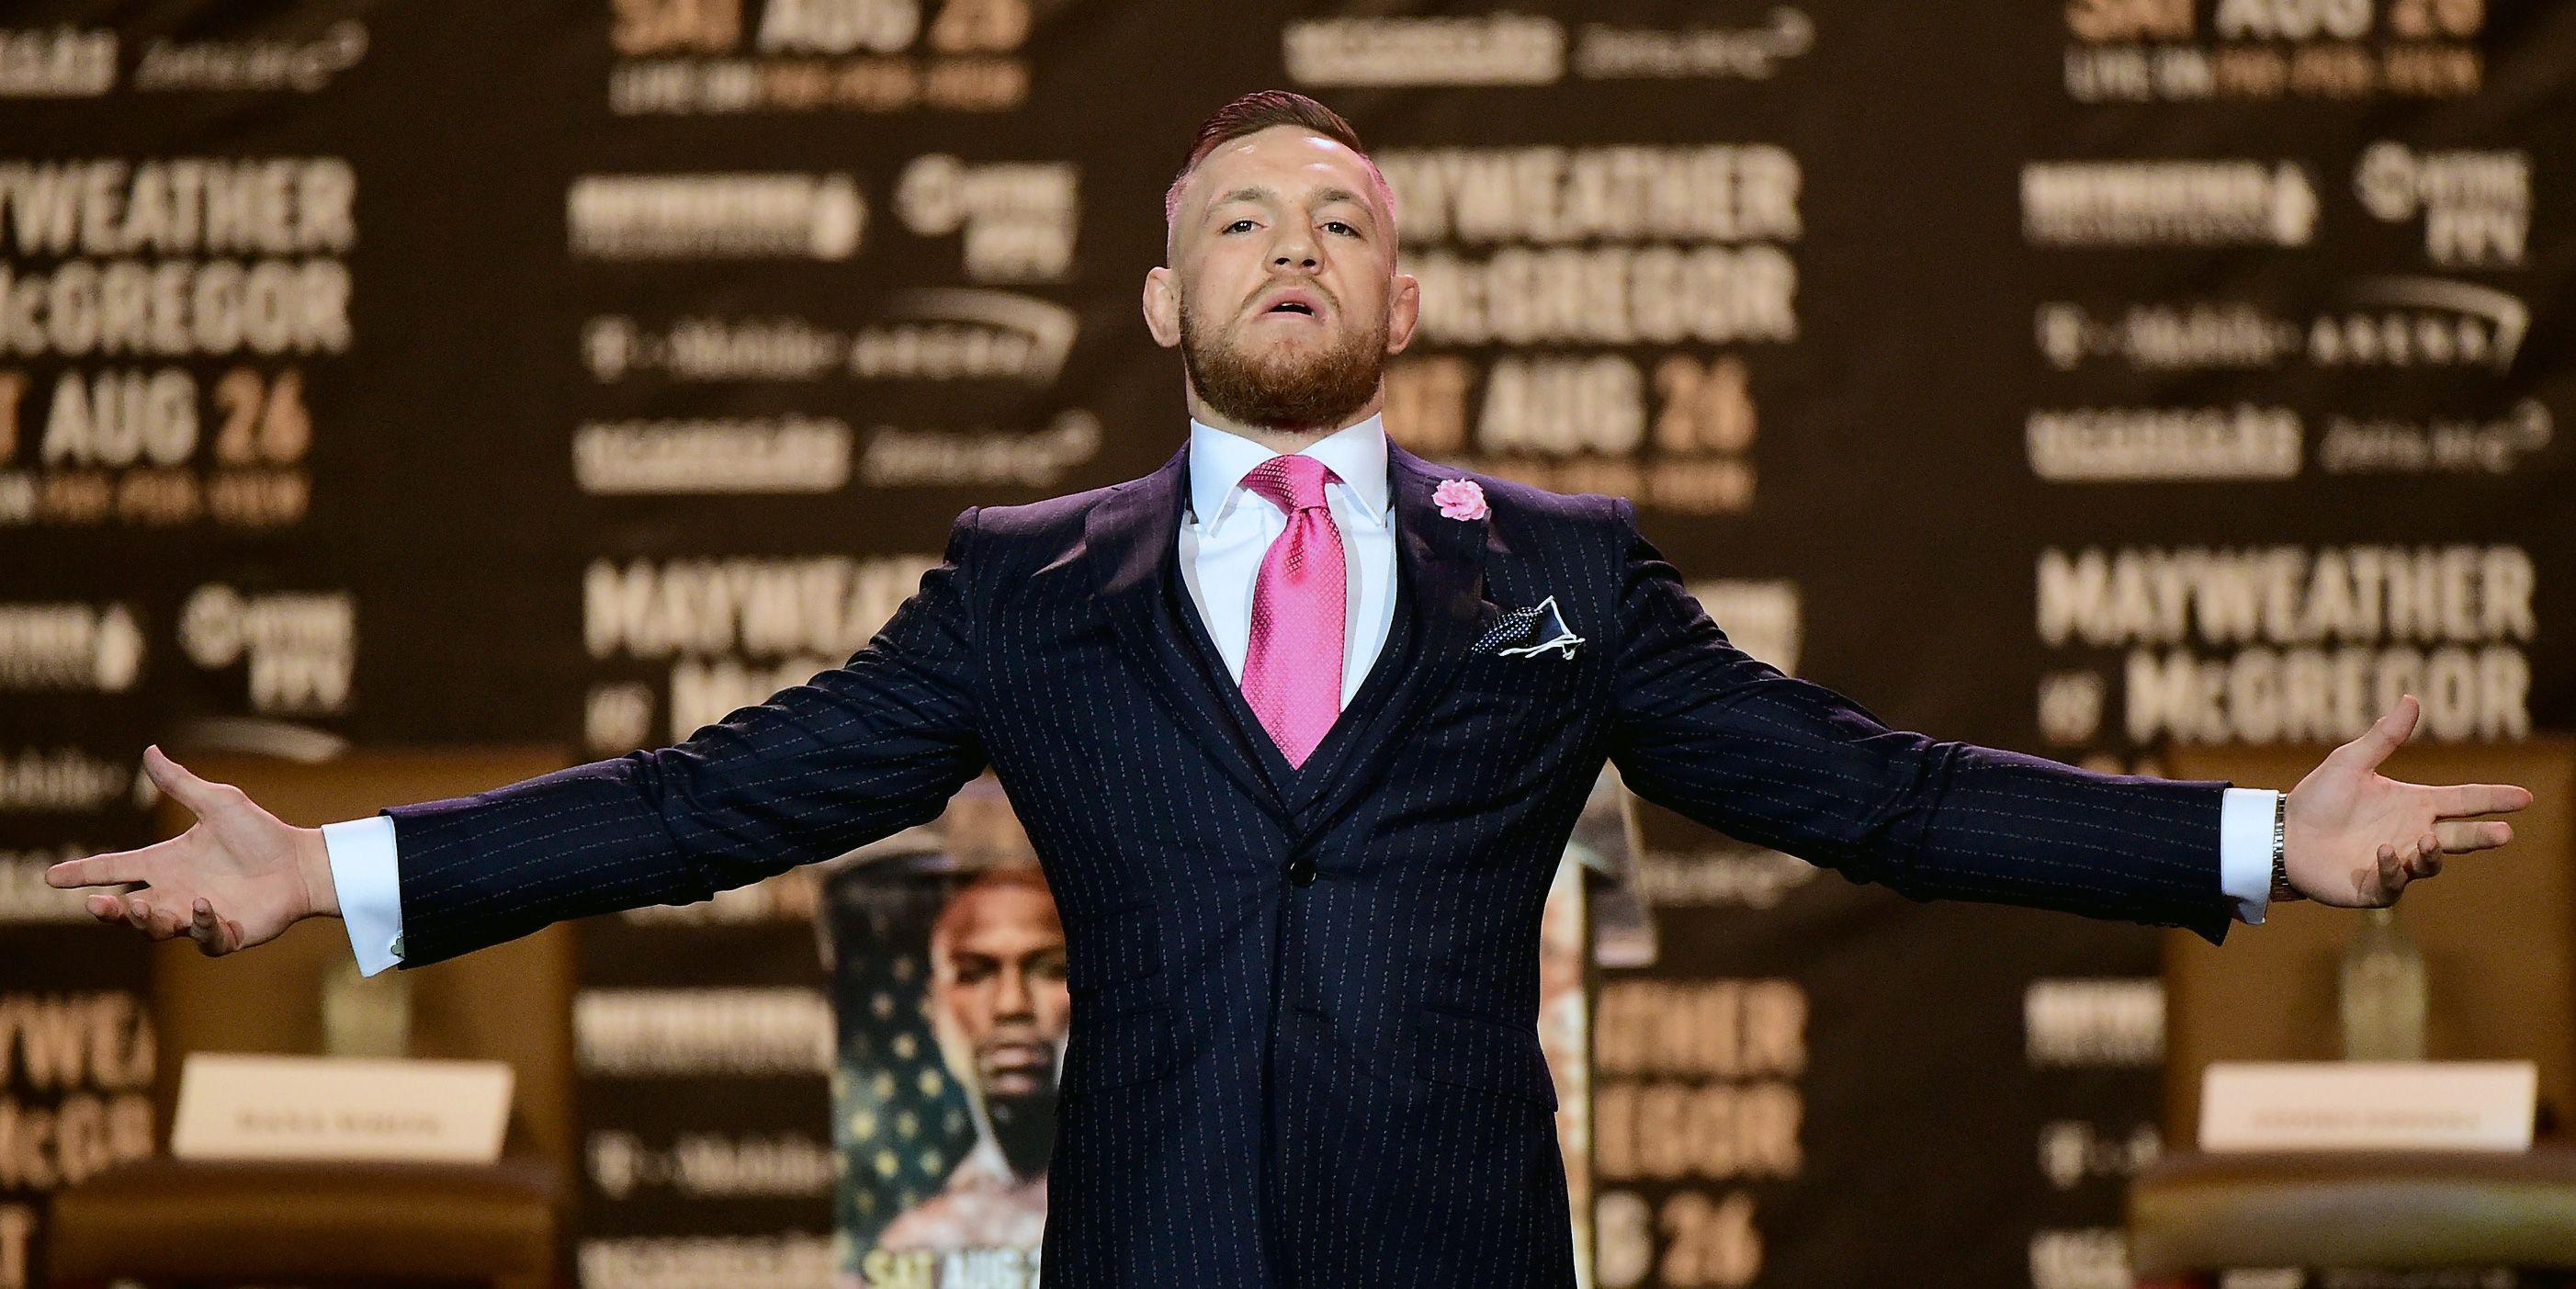 conor mcgregor in suit-ის სურათის შედეგი